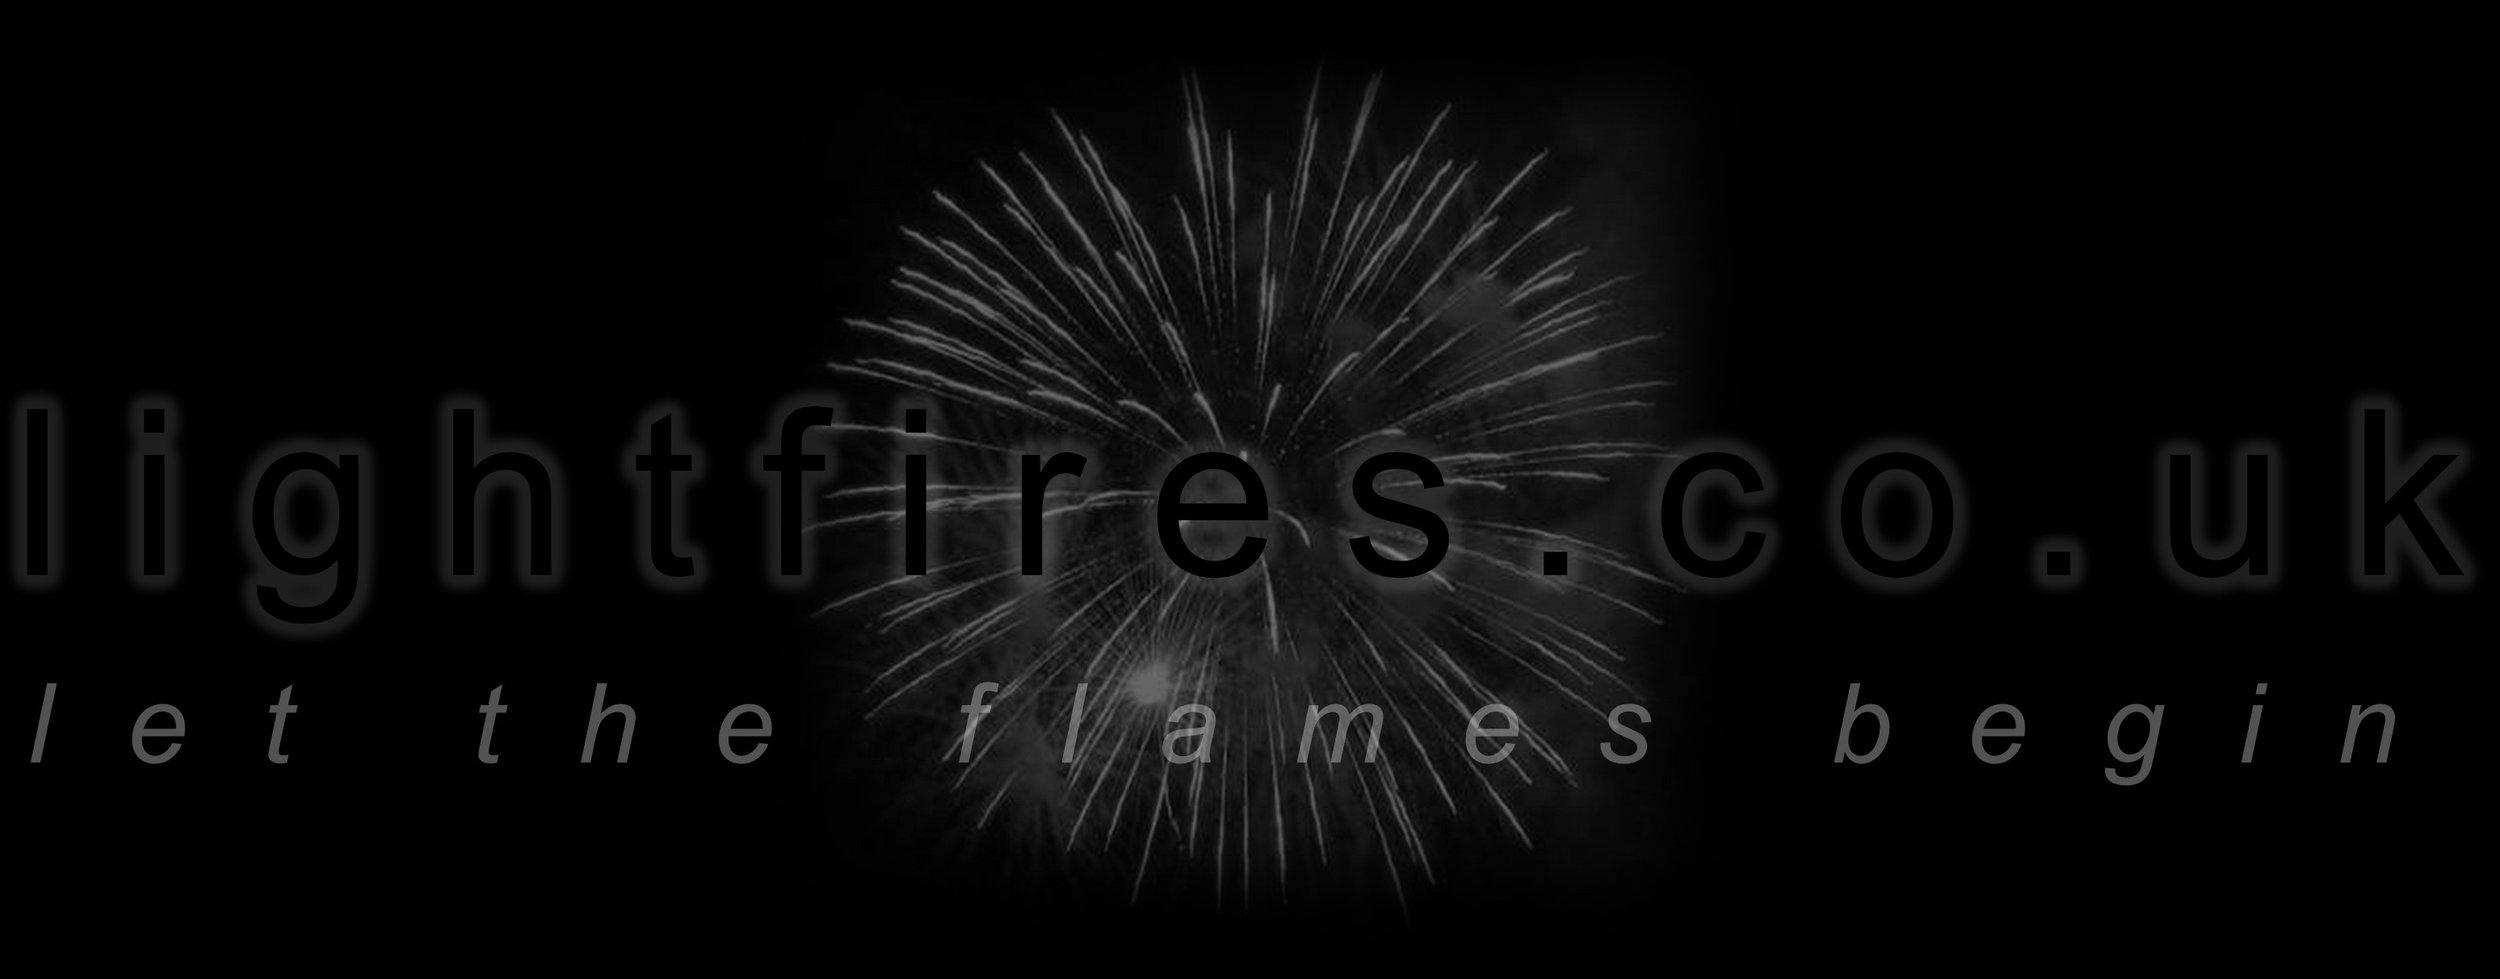 2016 logo 2.jpg